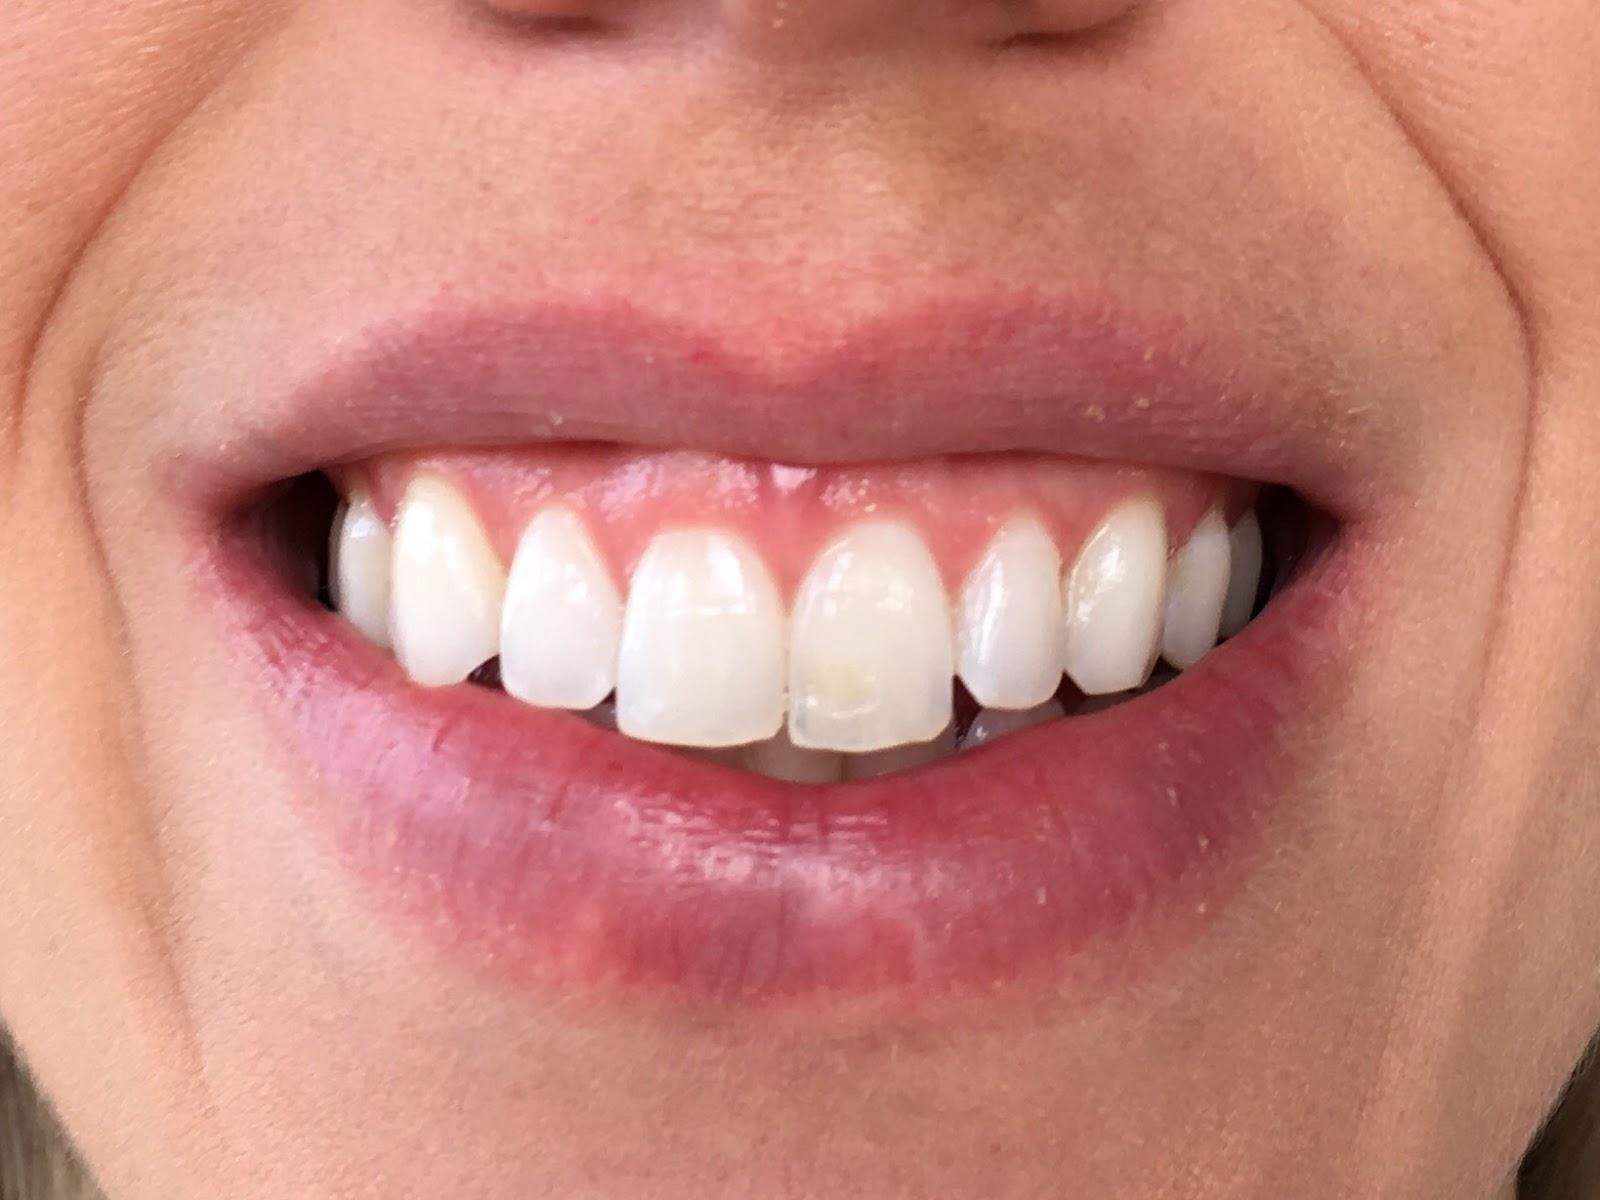 Smile Brilliant Teeth Whitening Impressions Day 4